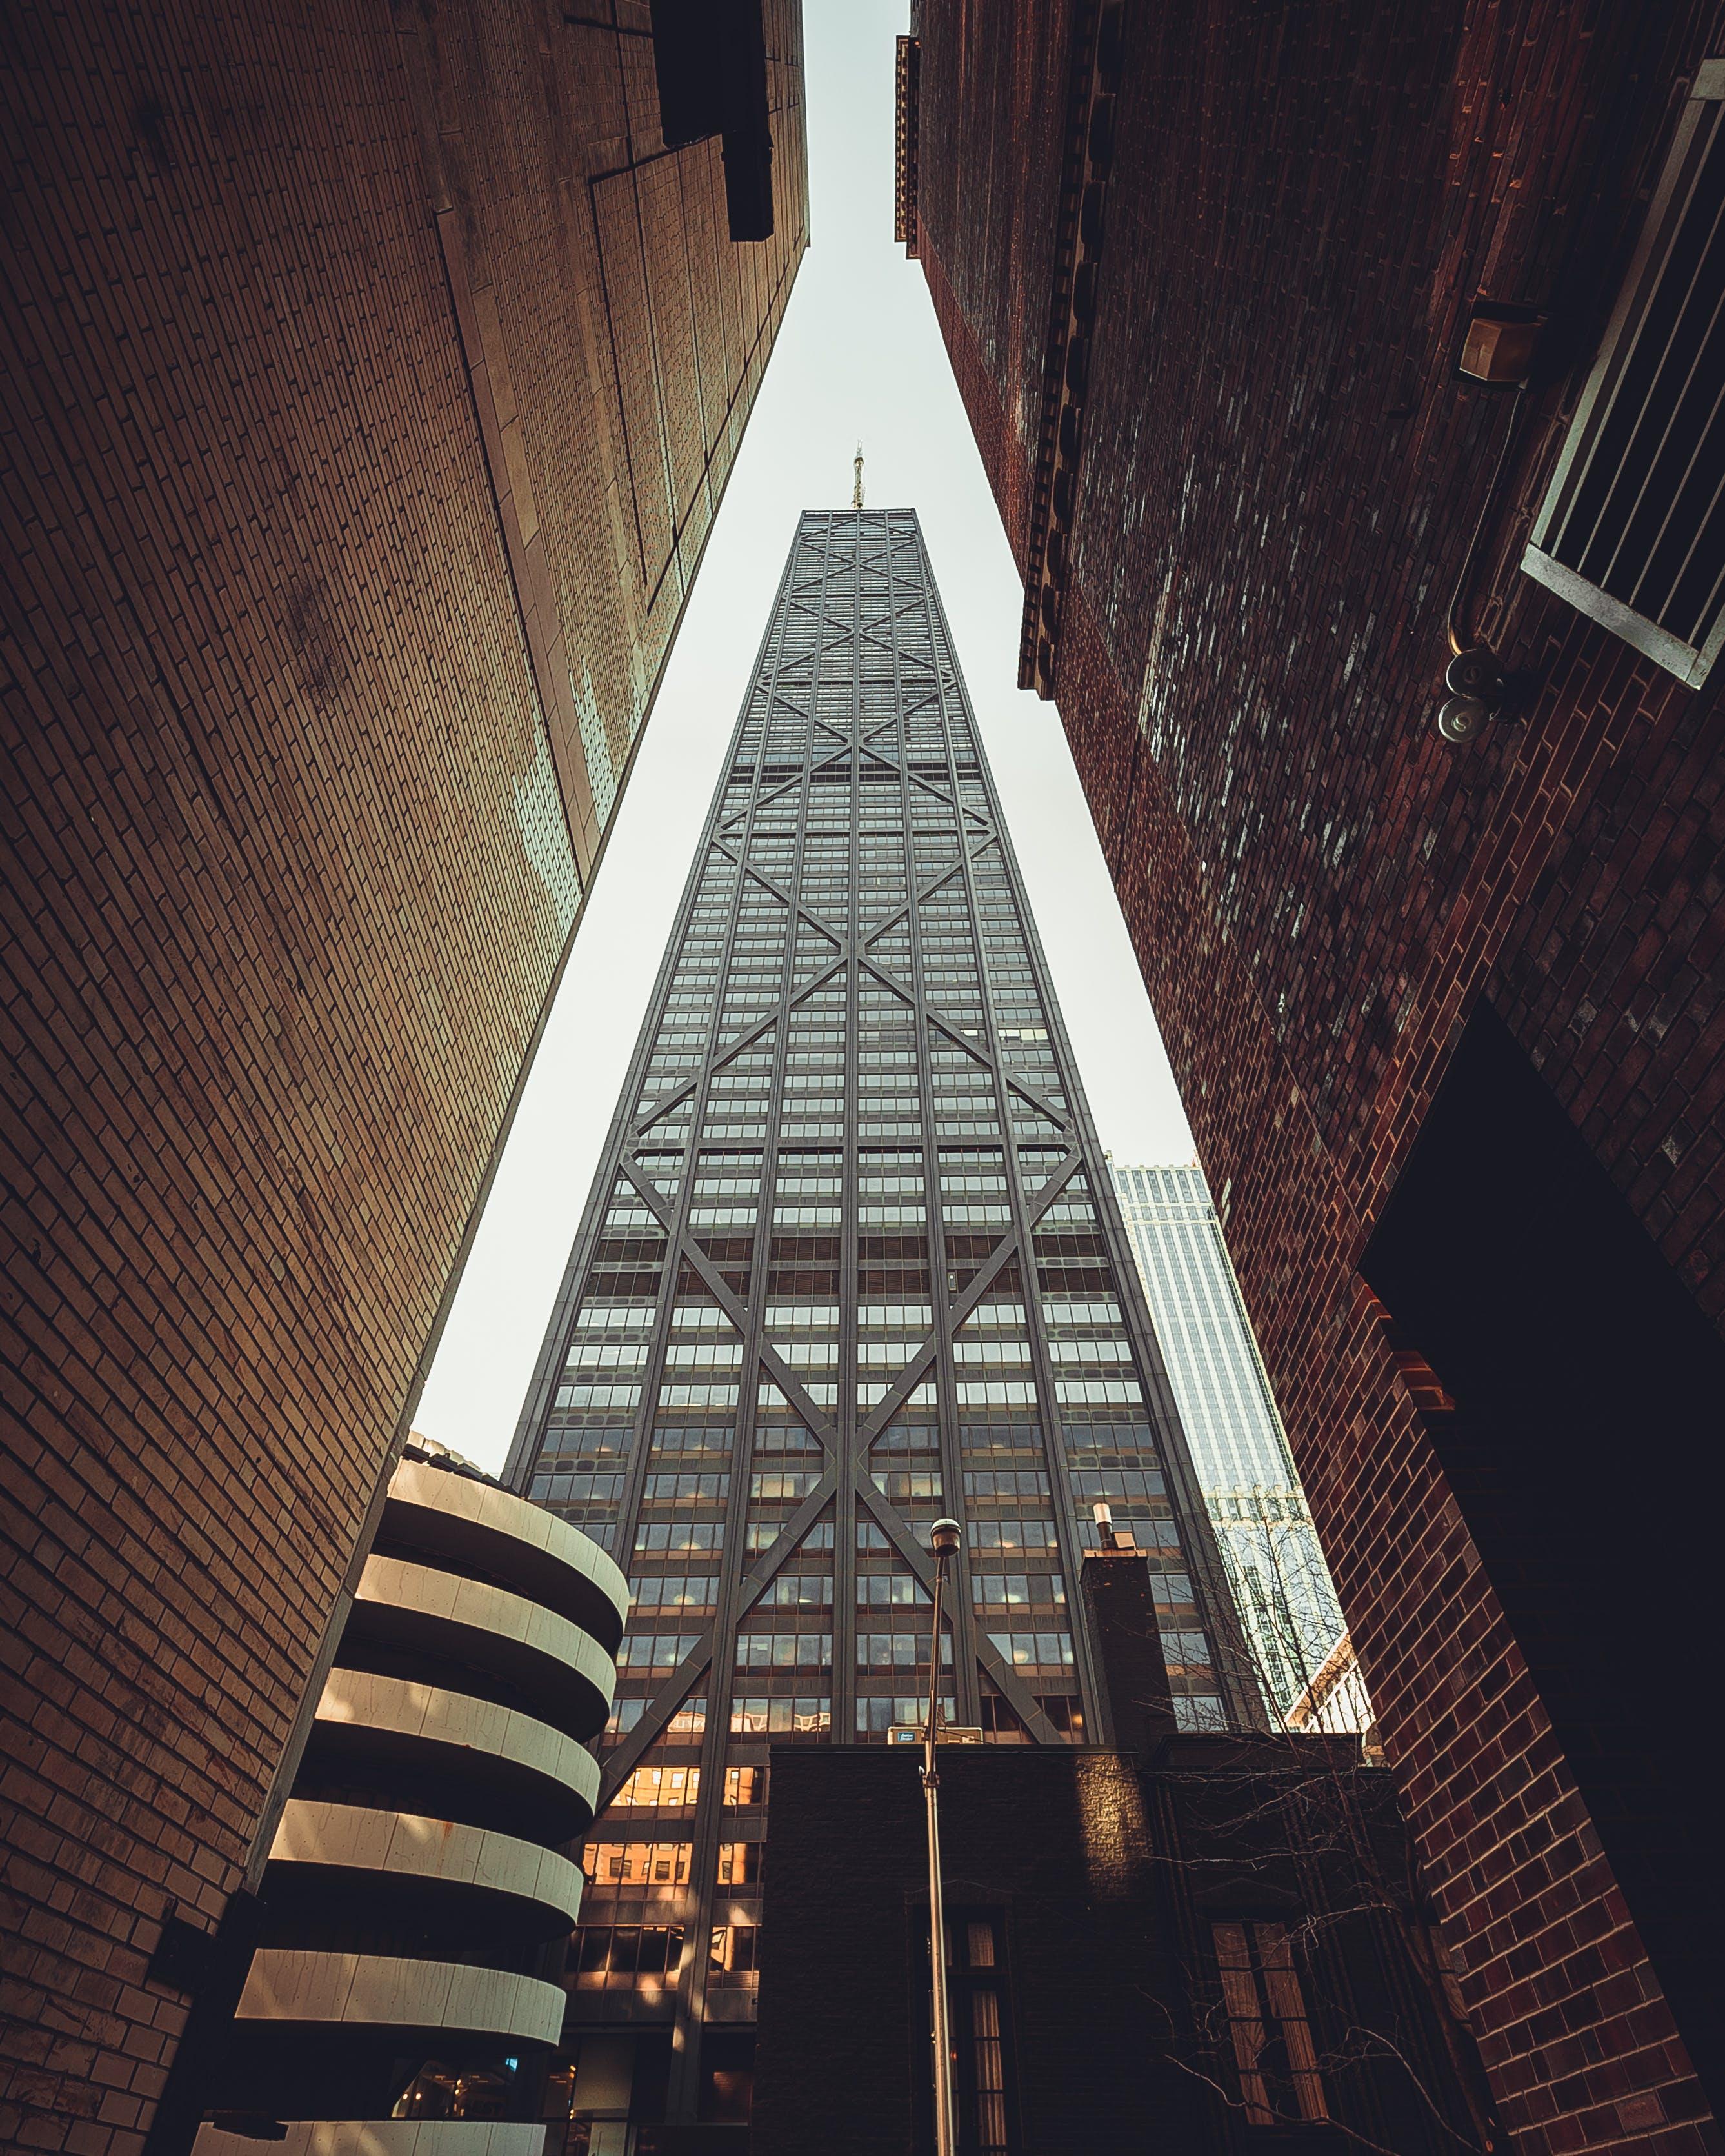 Foto d'estoc gratuïta de arquitectura, arquitectura moderna, contemporani, disseny arquitectònic